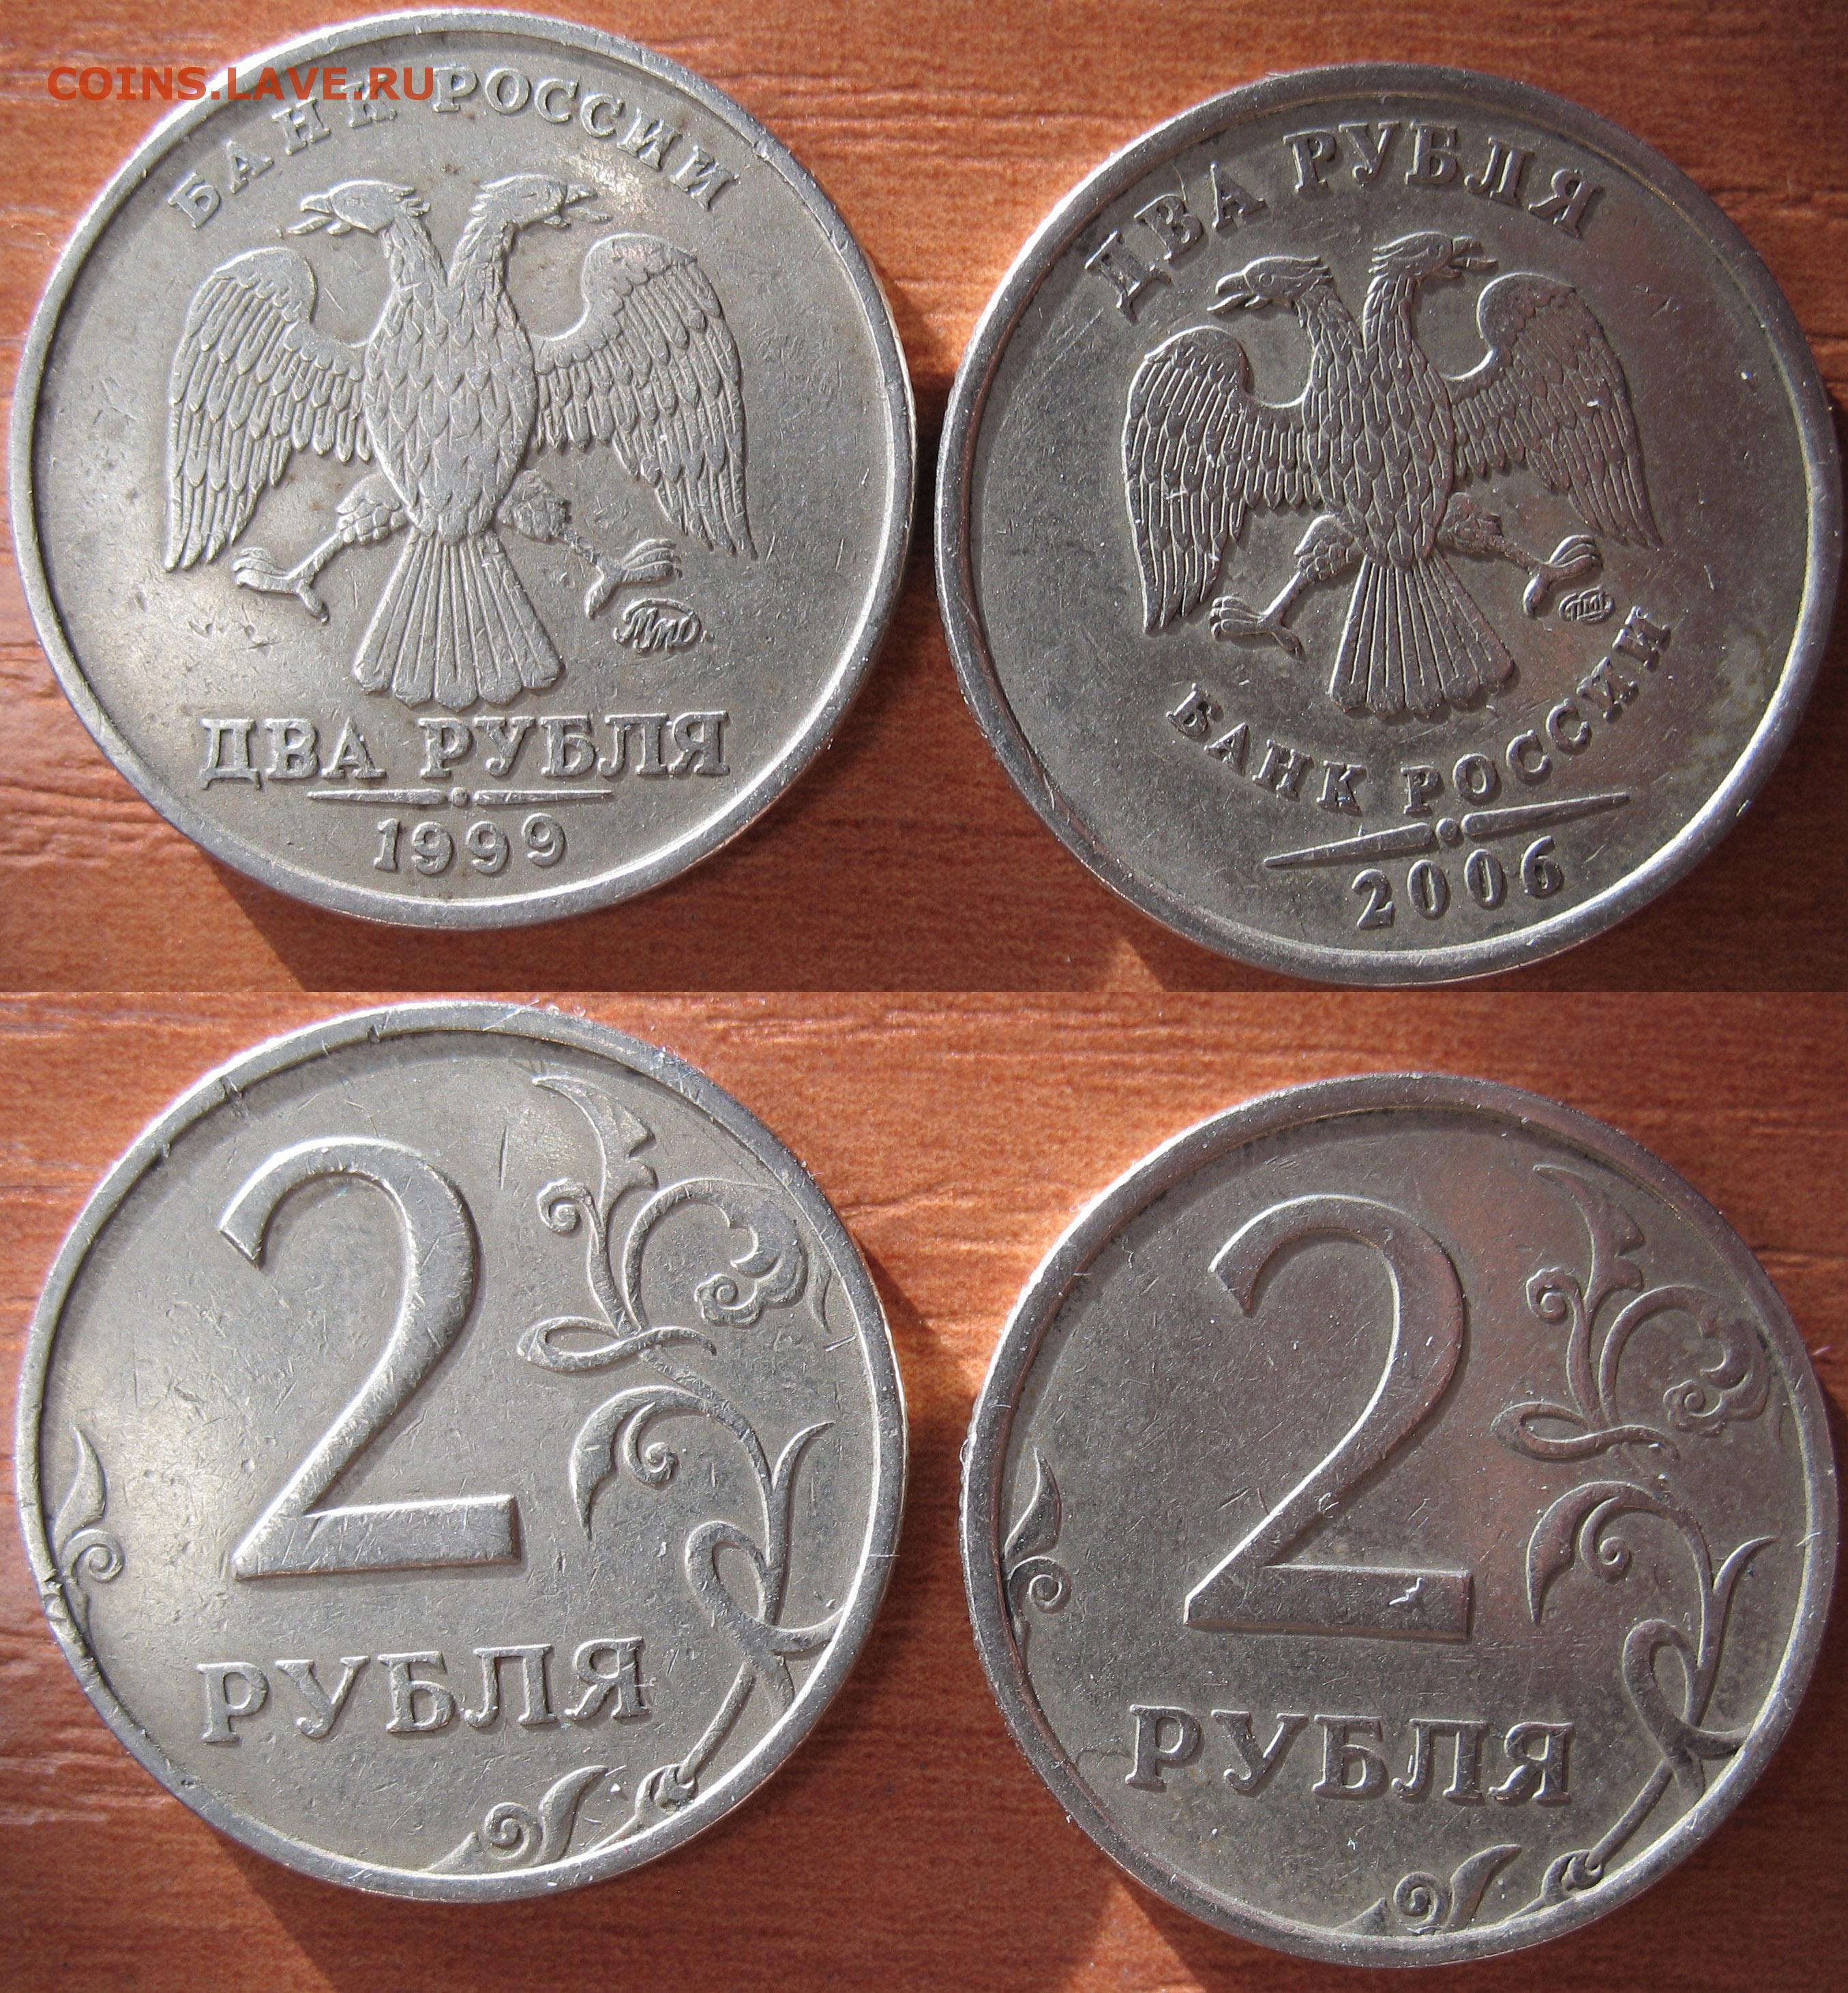 2 руб 2006 монета 1722 года два рубля цена продать